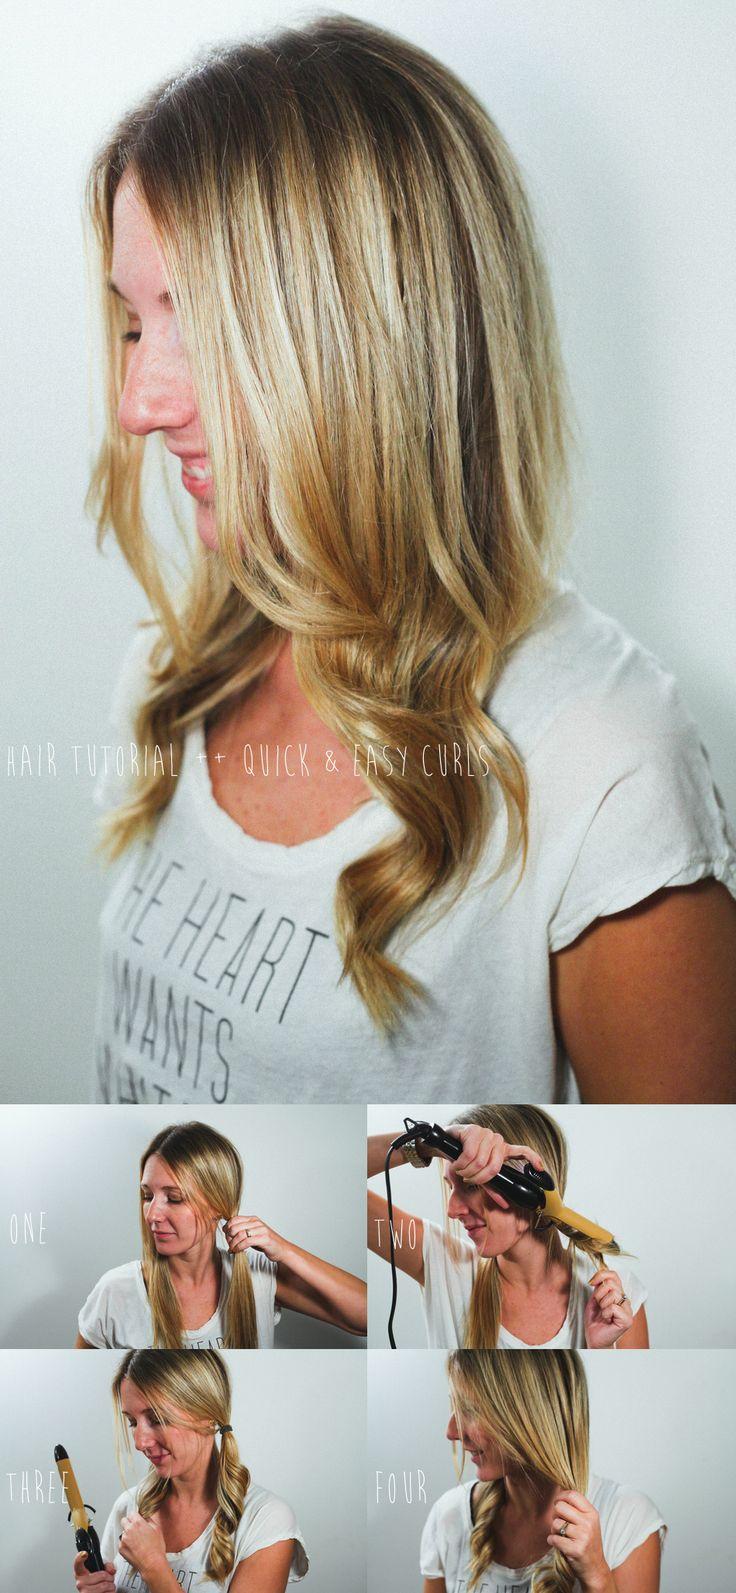 Hair Tutorial ++ Quick & Easy Curls